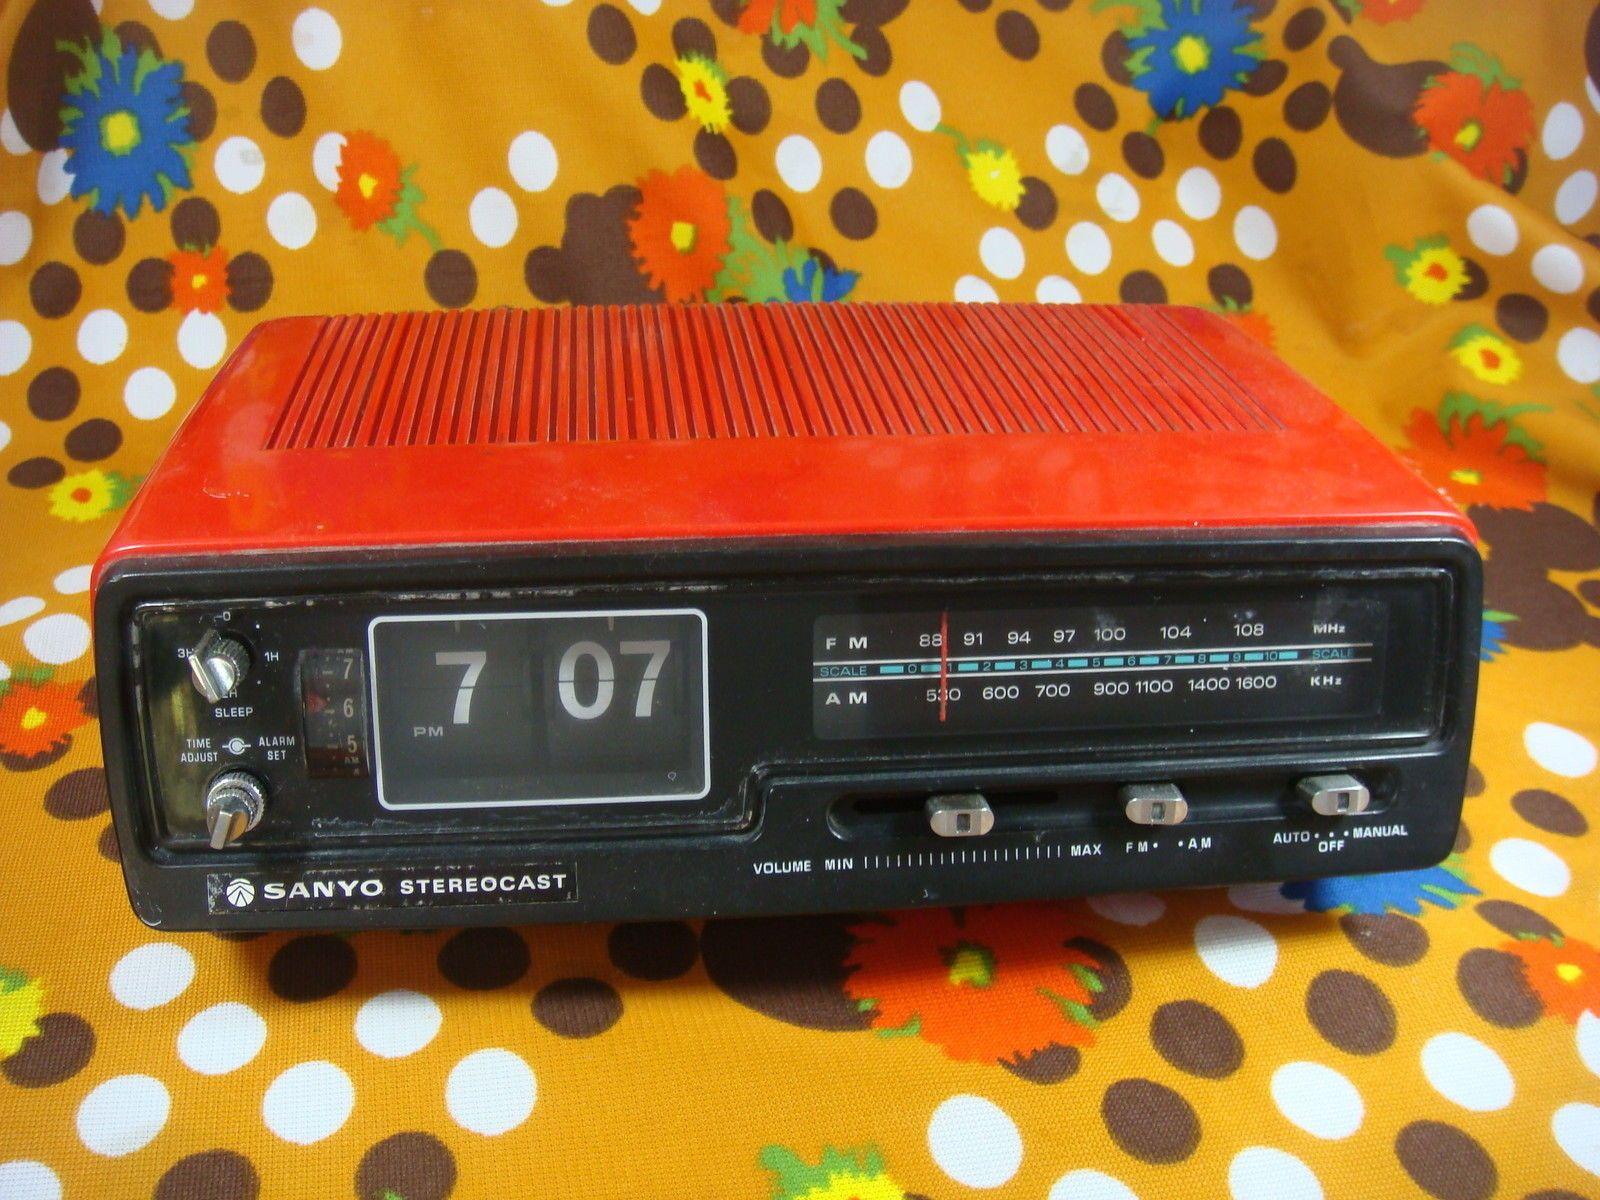 Vintage Sanyo Stereocast Flip Alarm Clock Radio Red Rm5320